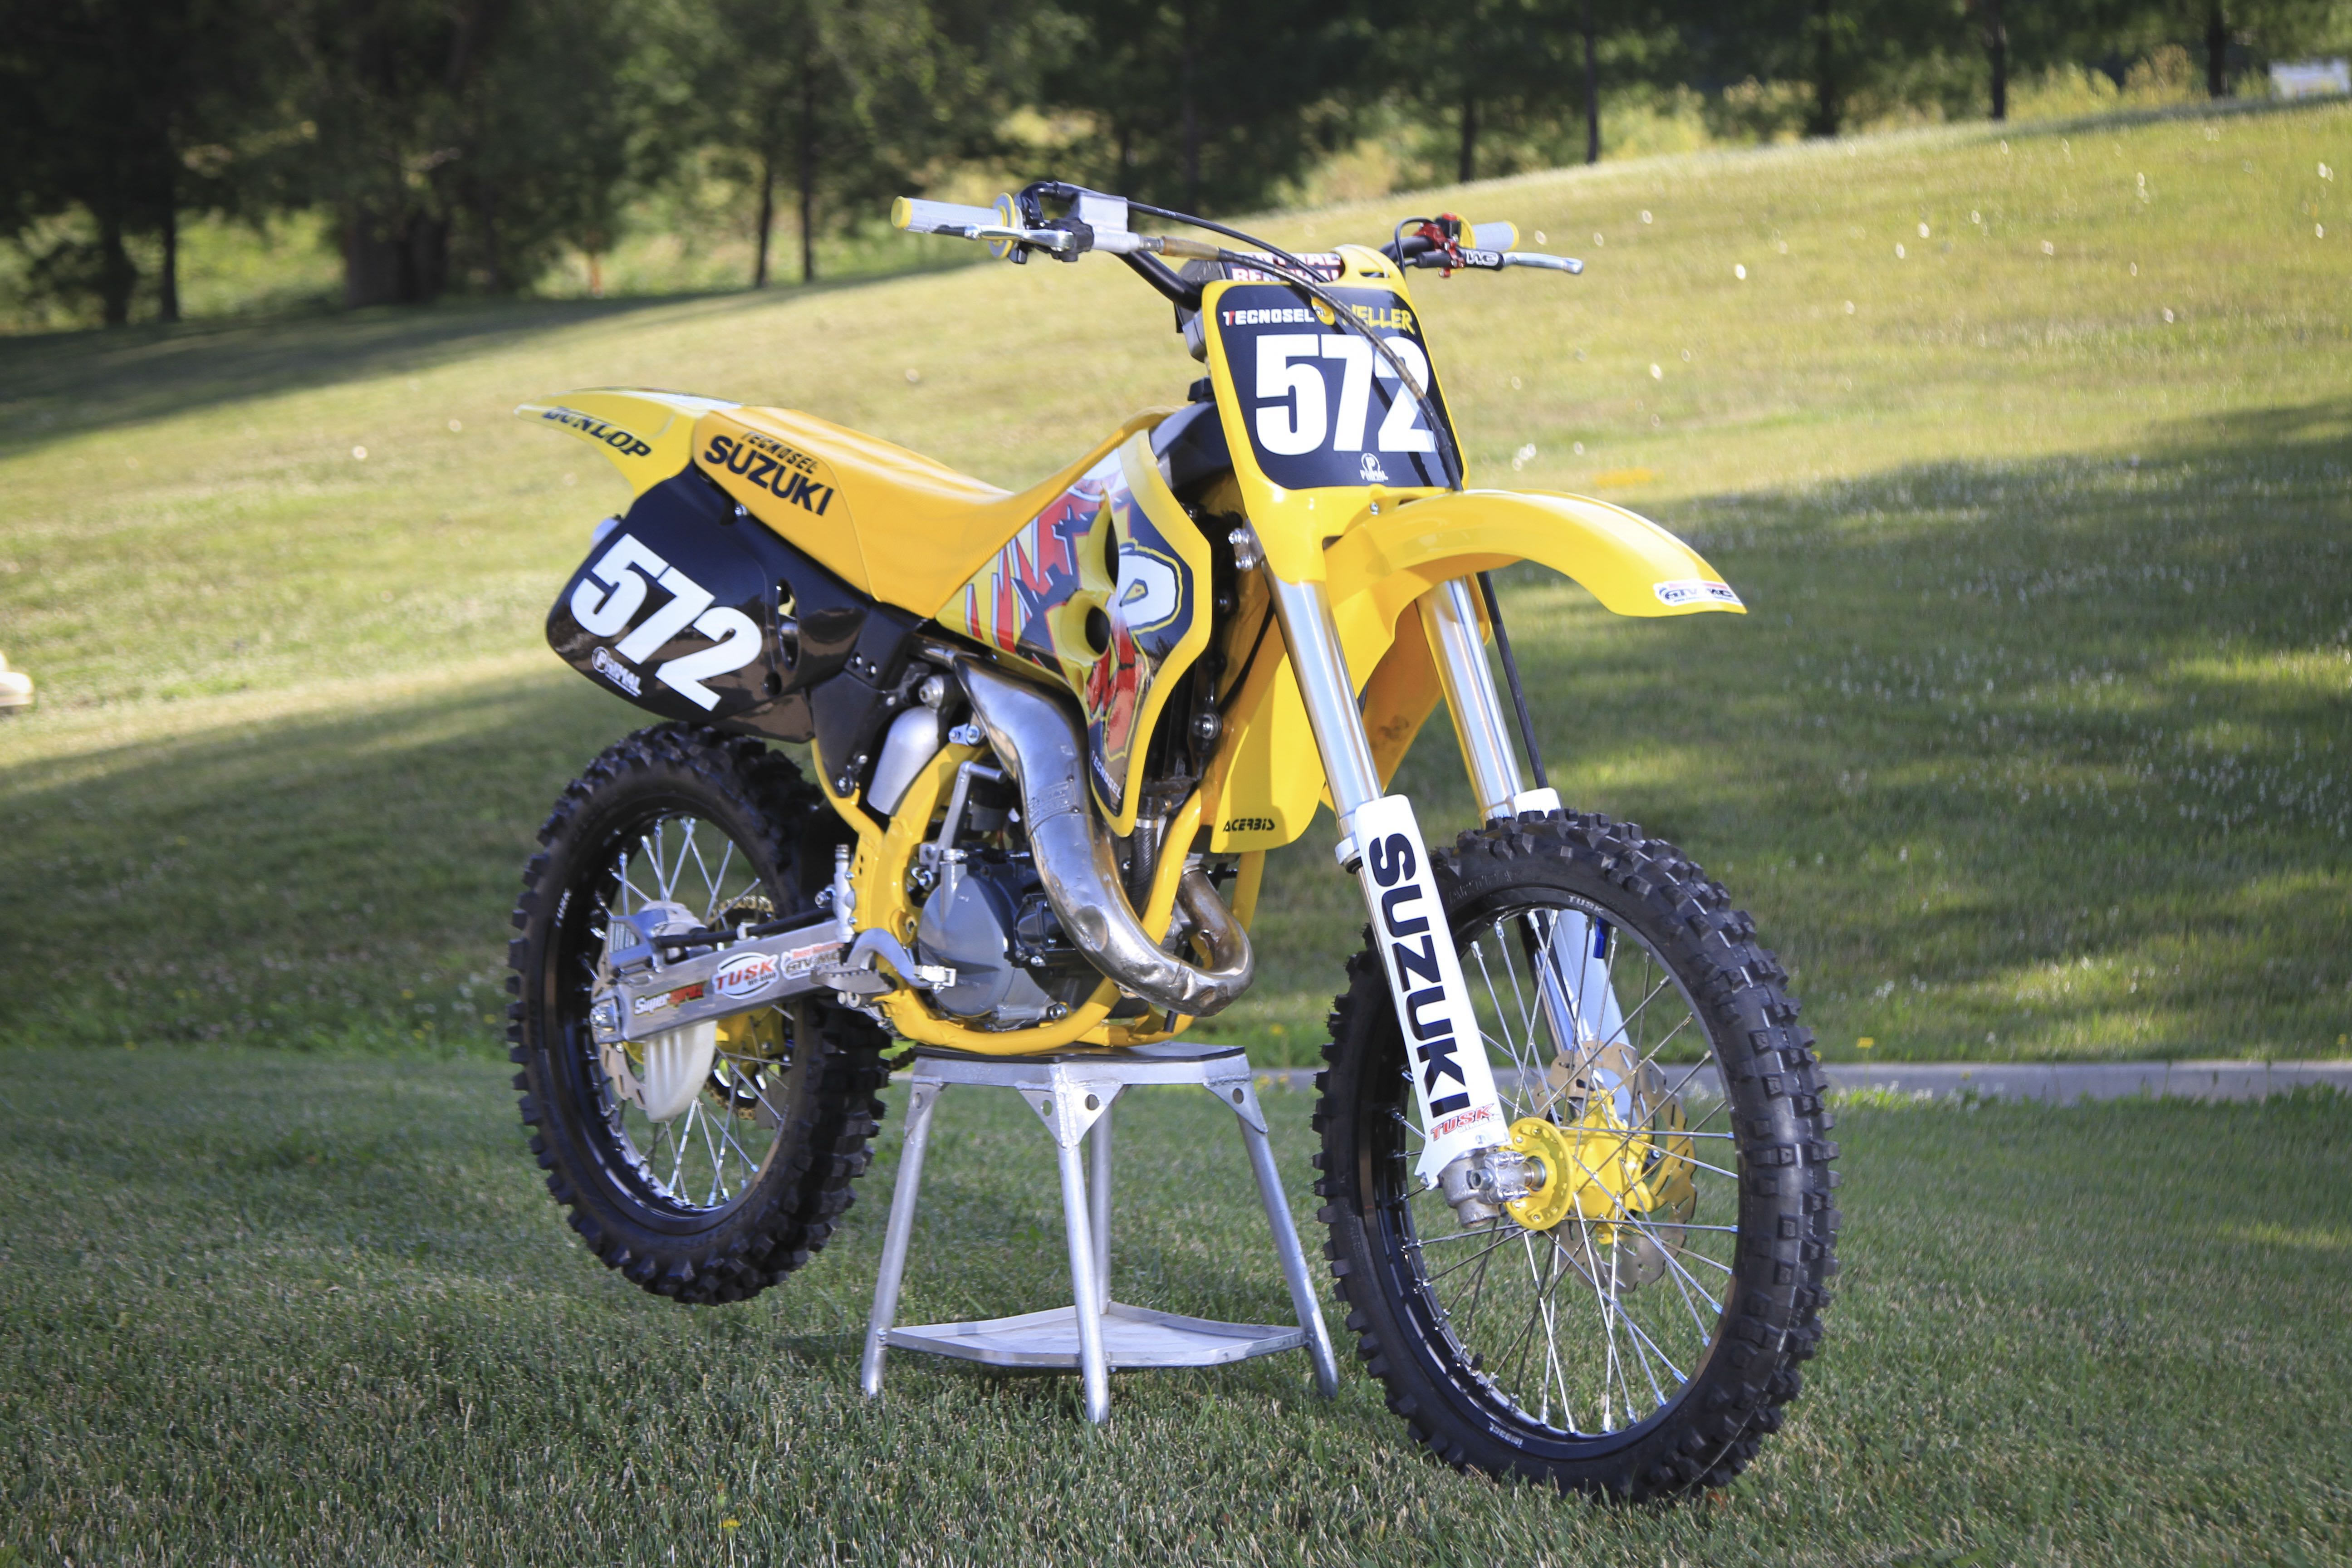 matt wellers1994 suzuki rm125 project bike primal x motorsports motocross graphics atv. Black Bedroom Furniture Sets. Home Design Ideas